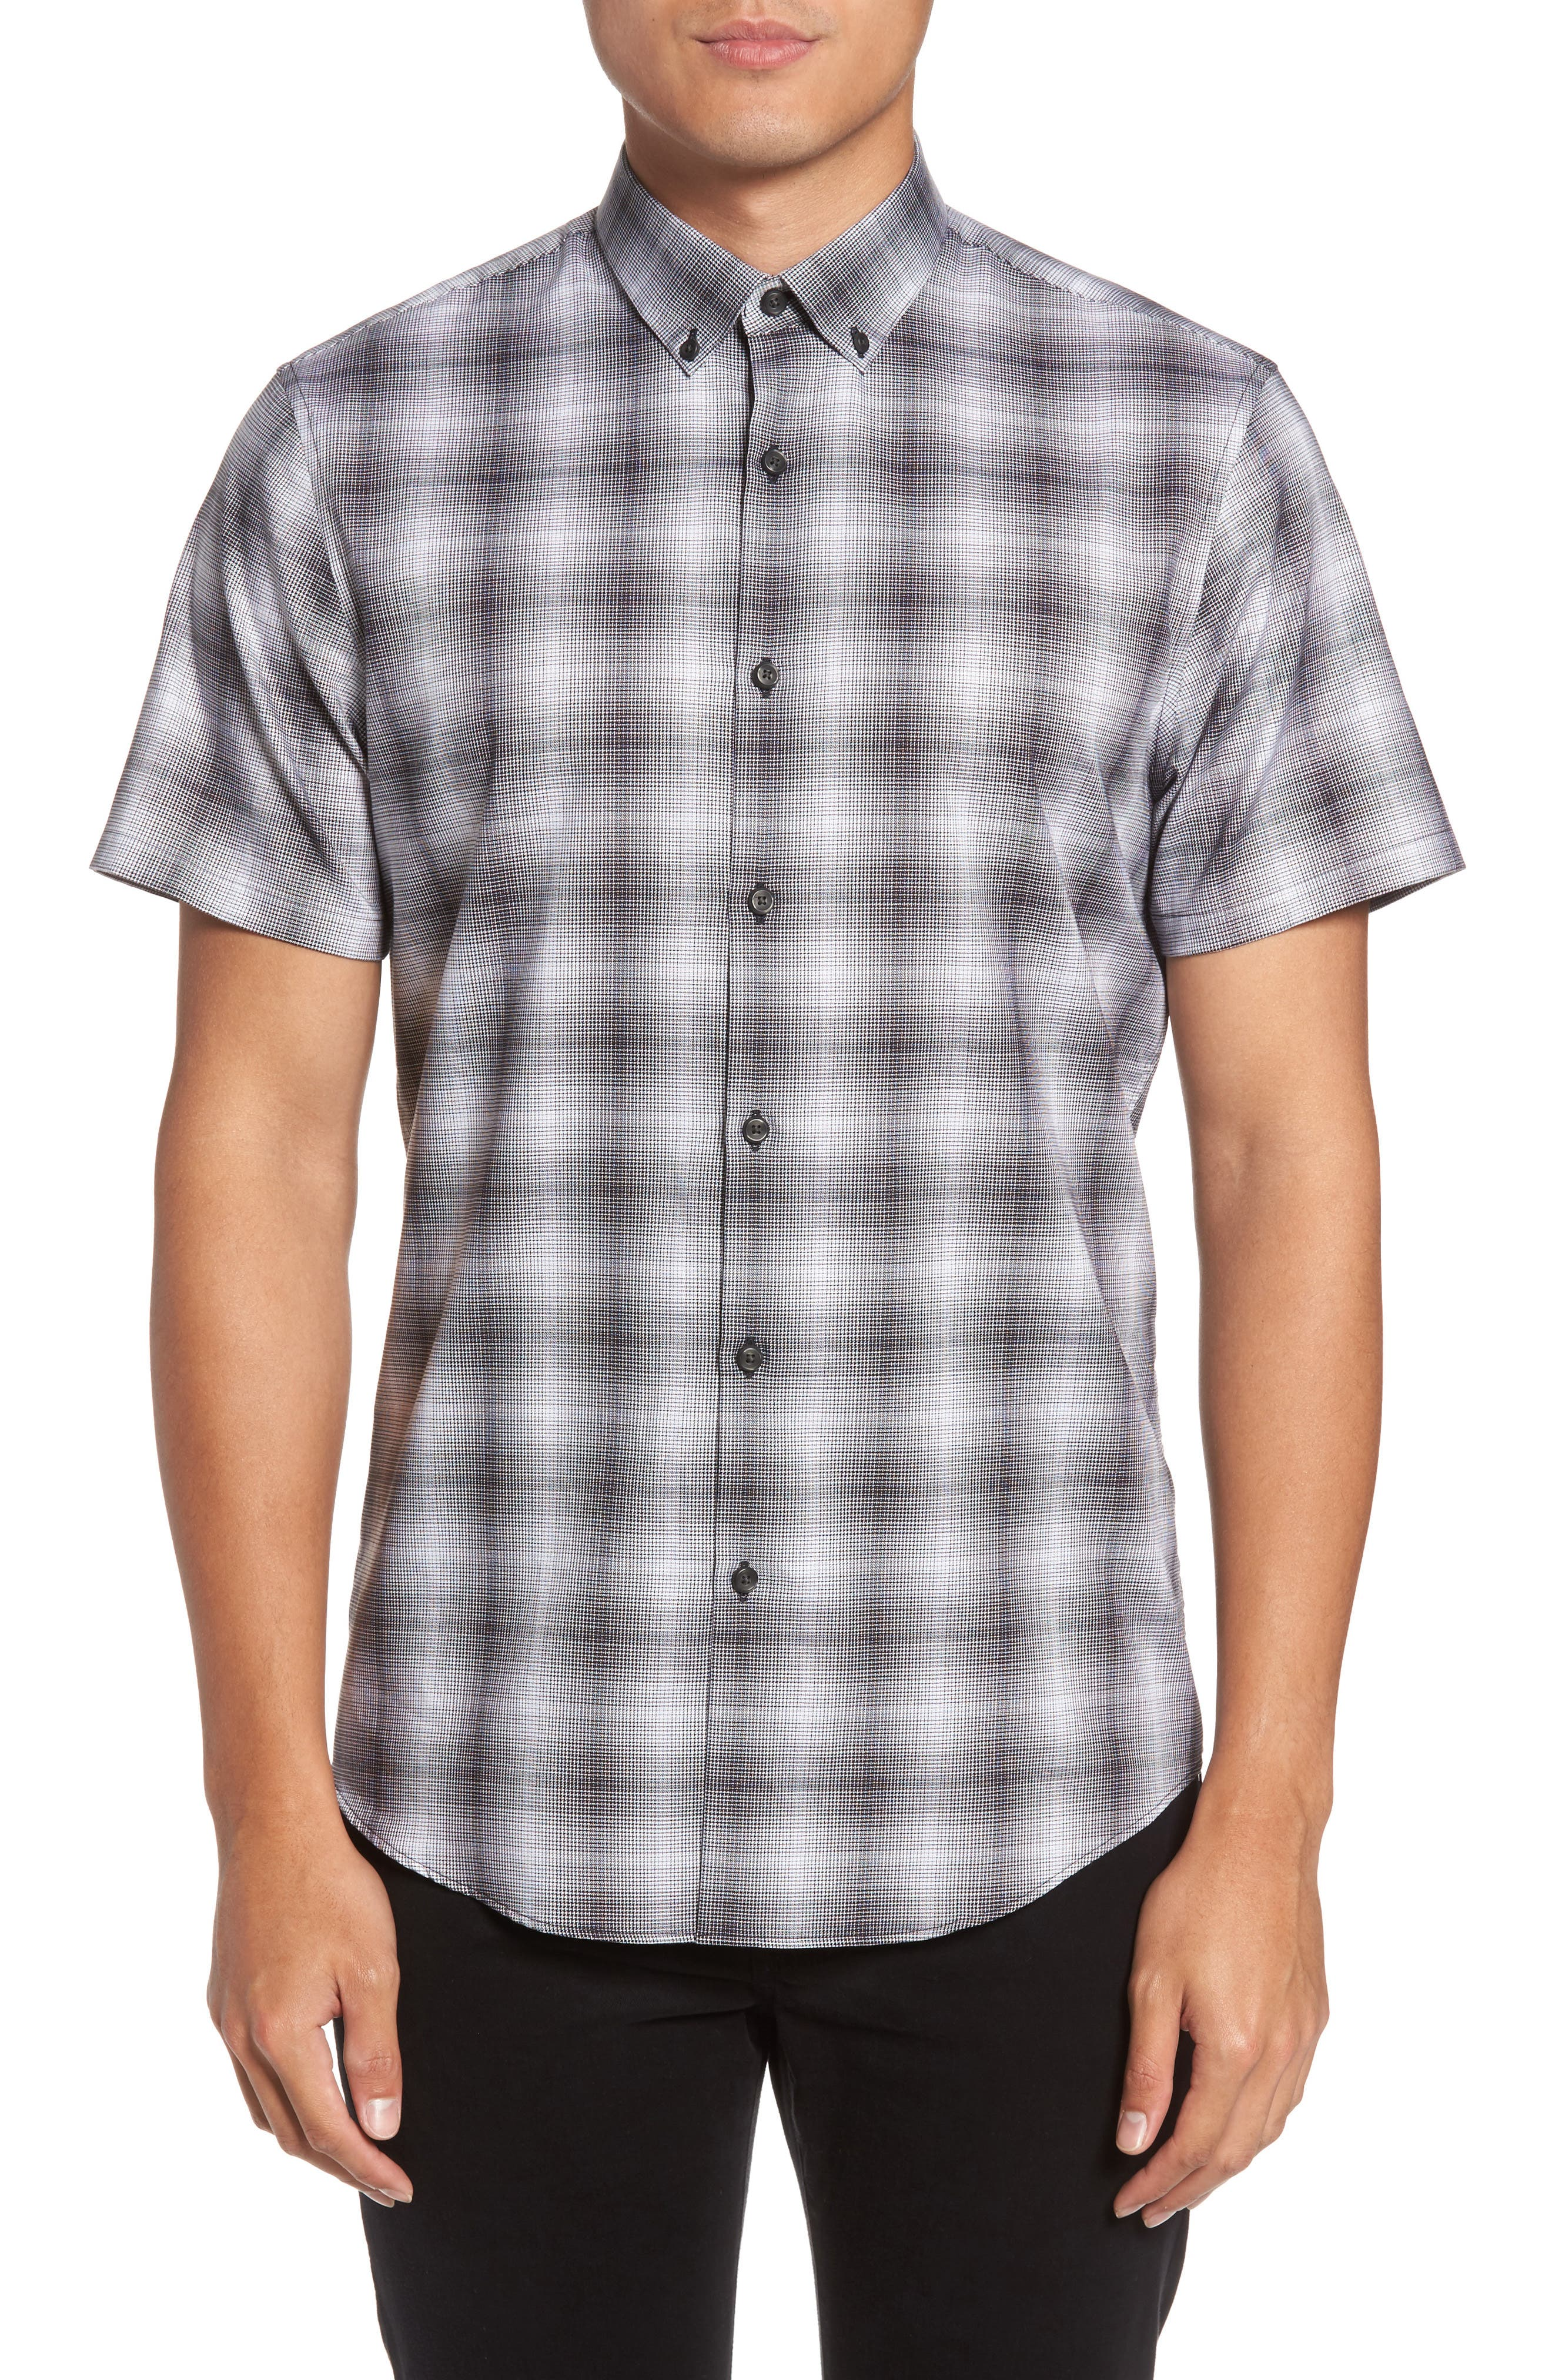 Non-Iron Moiré Plaid Woven Shirt,                             Main thumbnail 1, color,                             Black Houndstooth Plaid